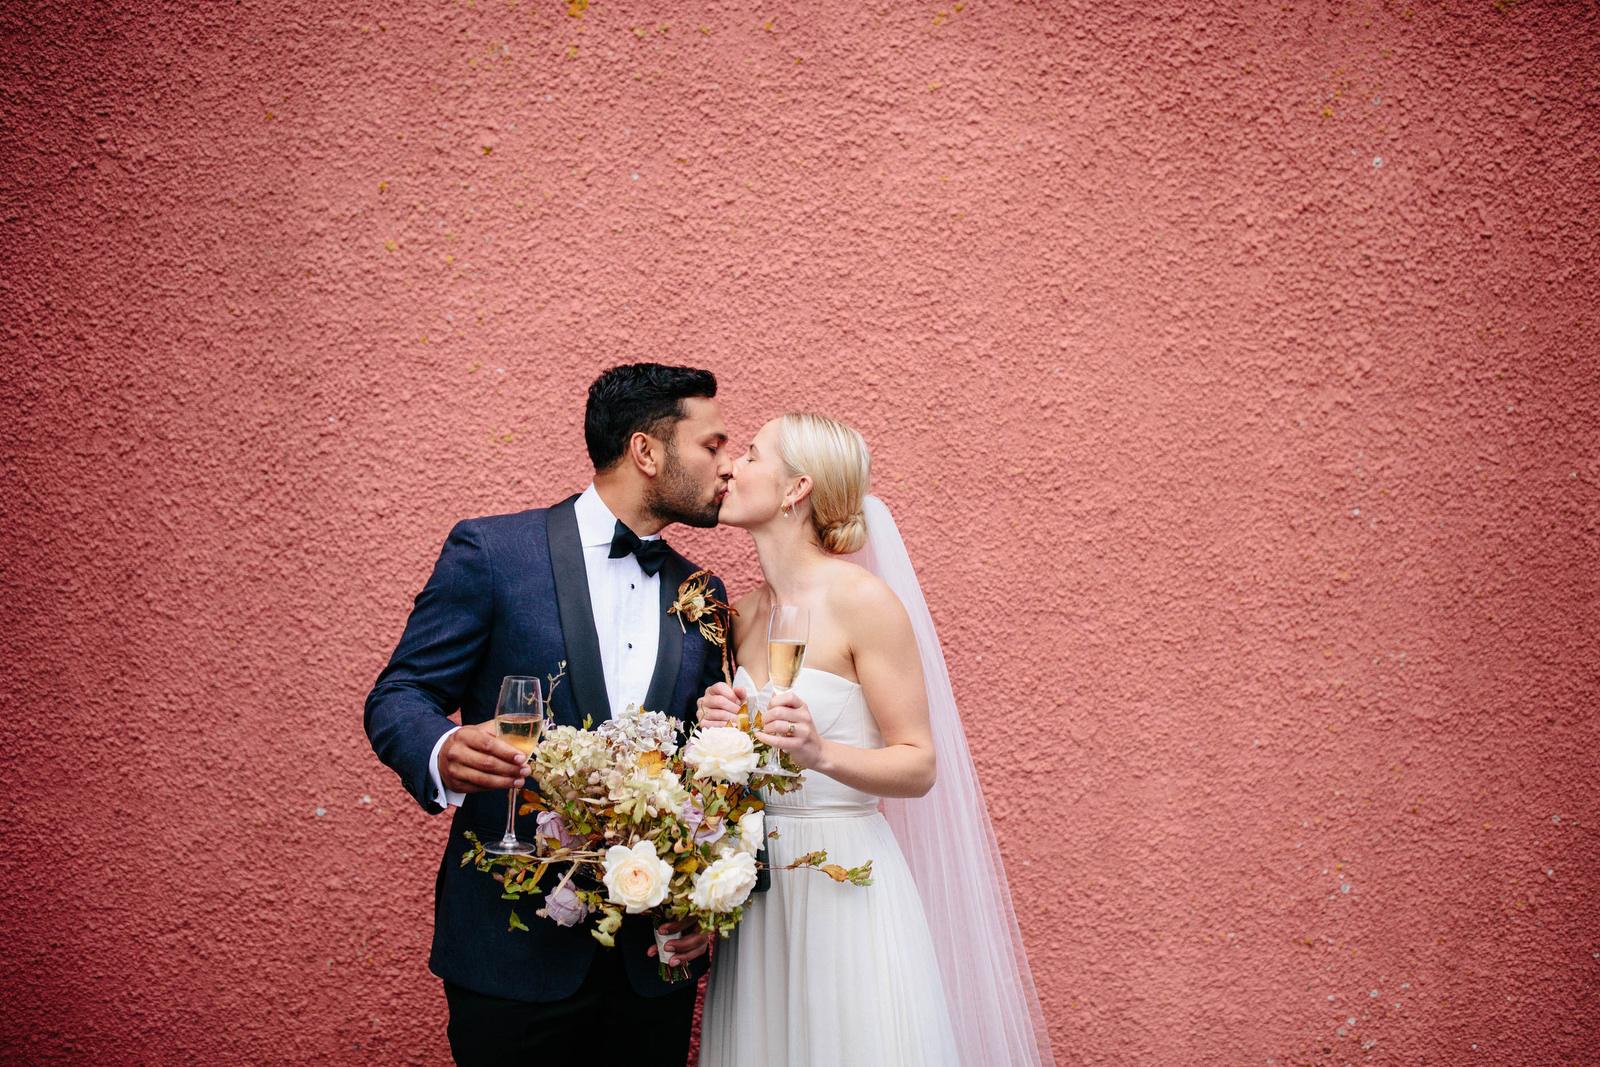 wedding-venue-Rose&Smith-31.JPG